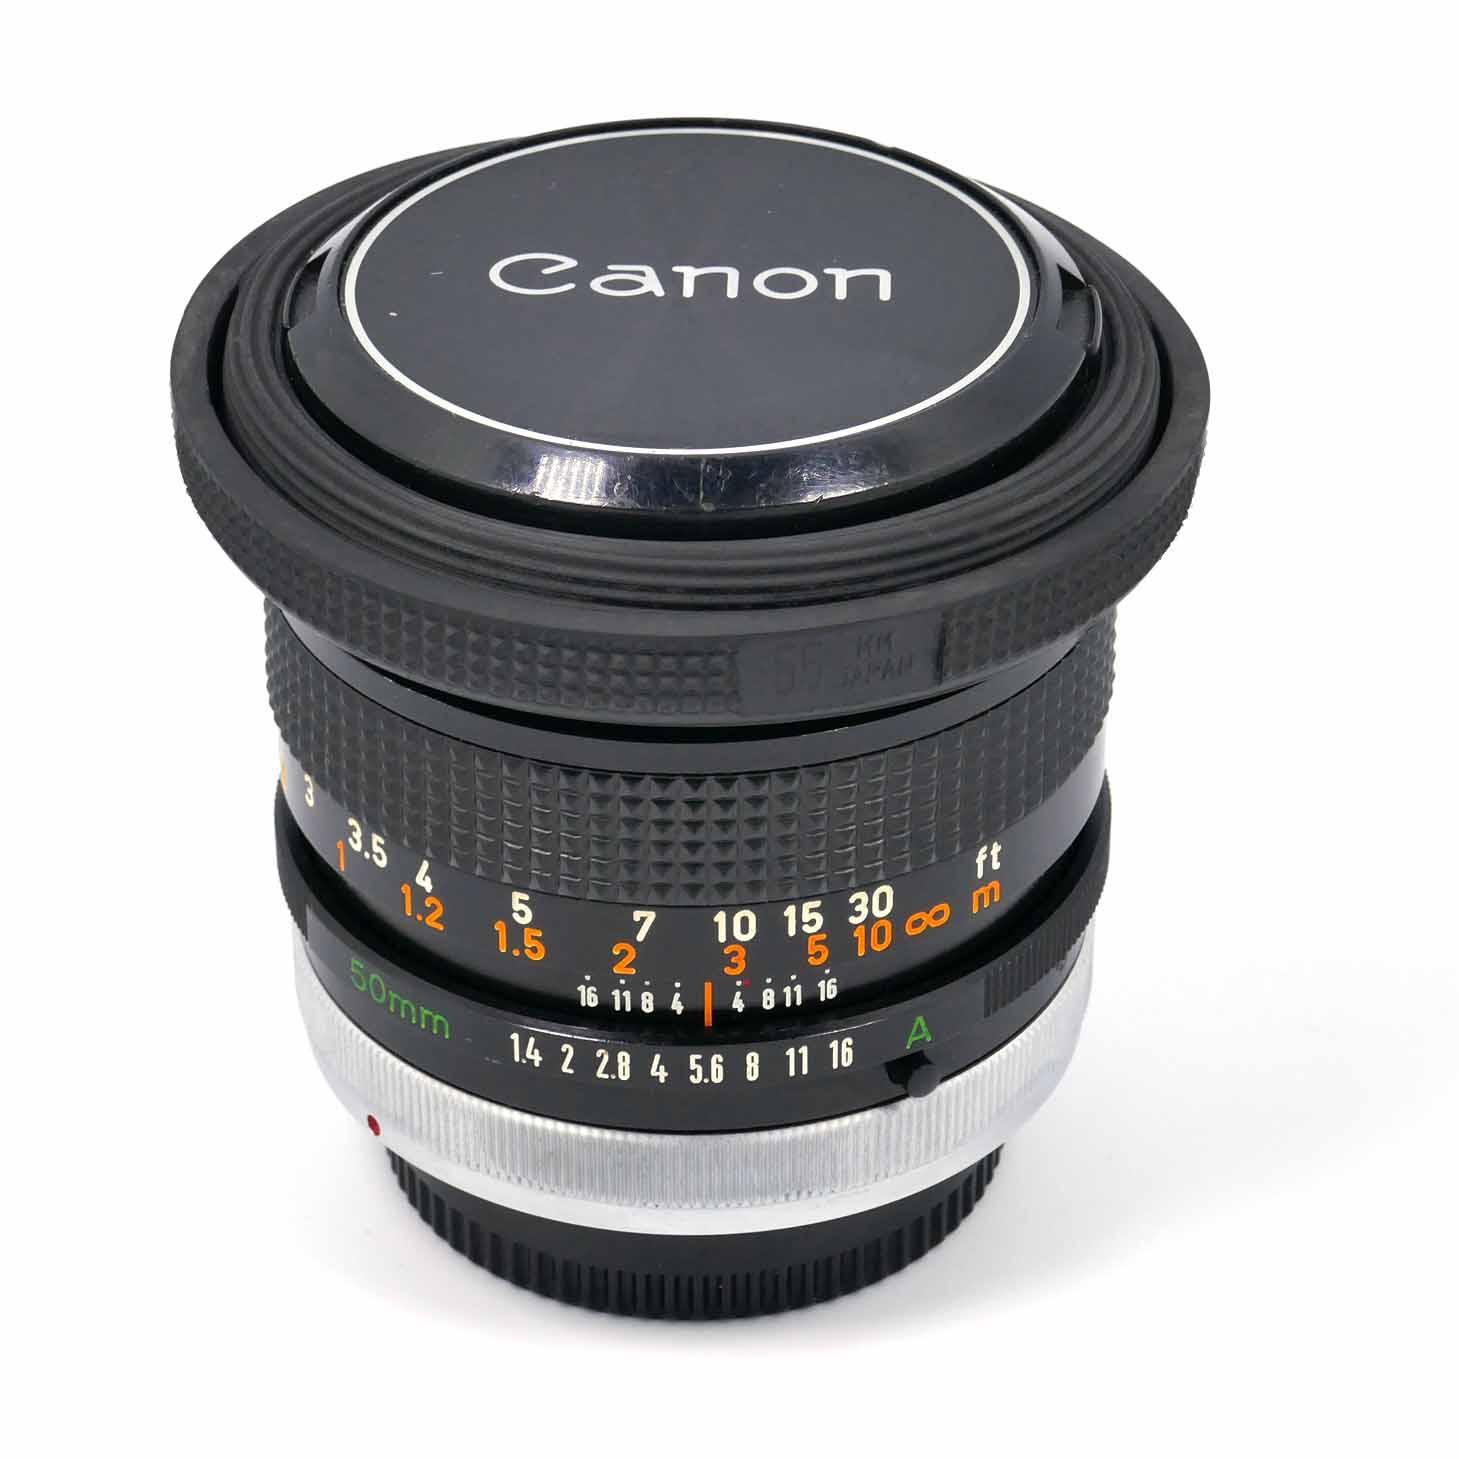 clean-cameras-Canon-FD-50mm-1.4-s.s.c-01